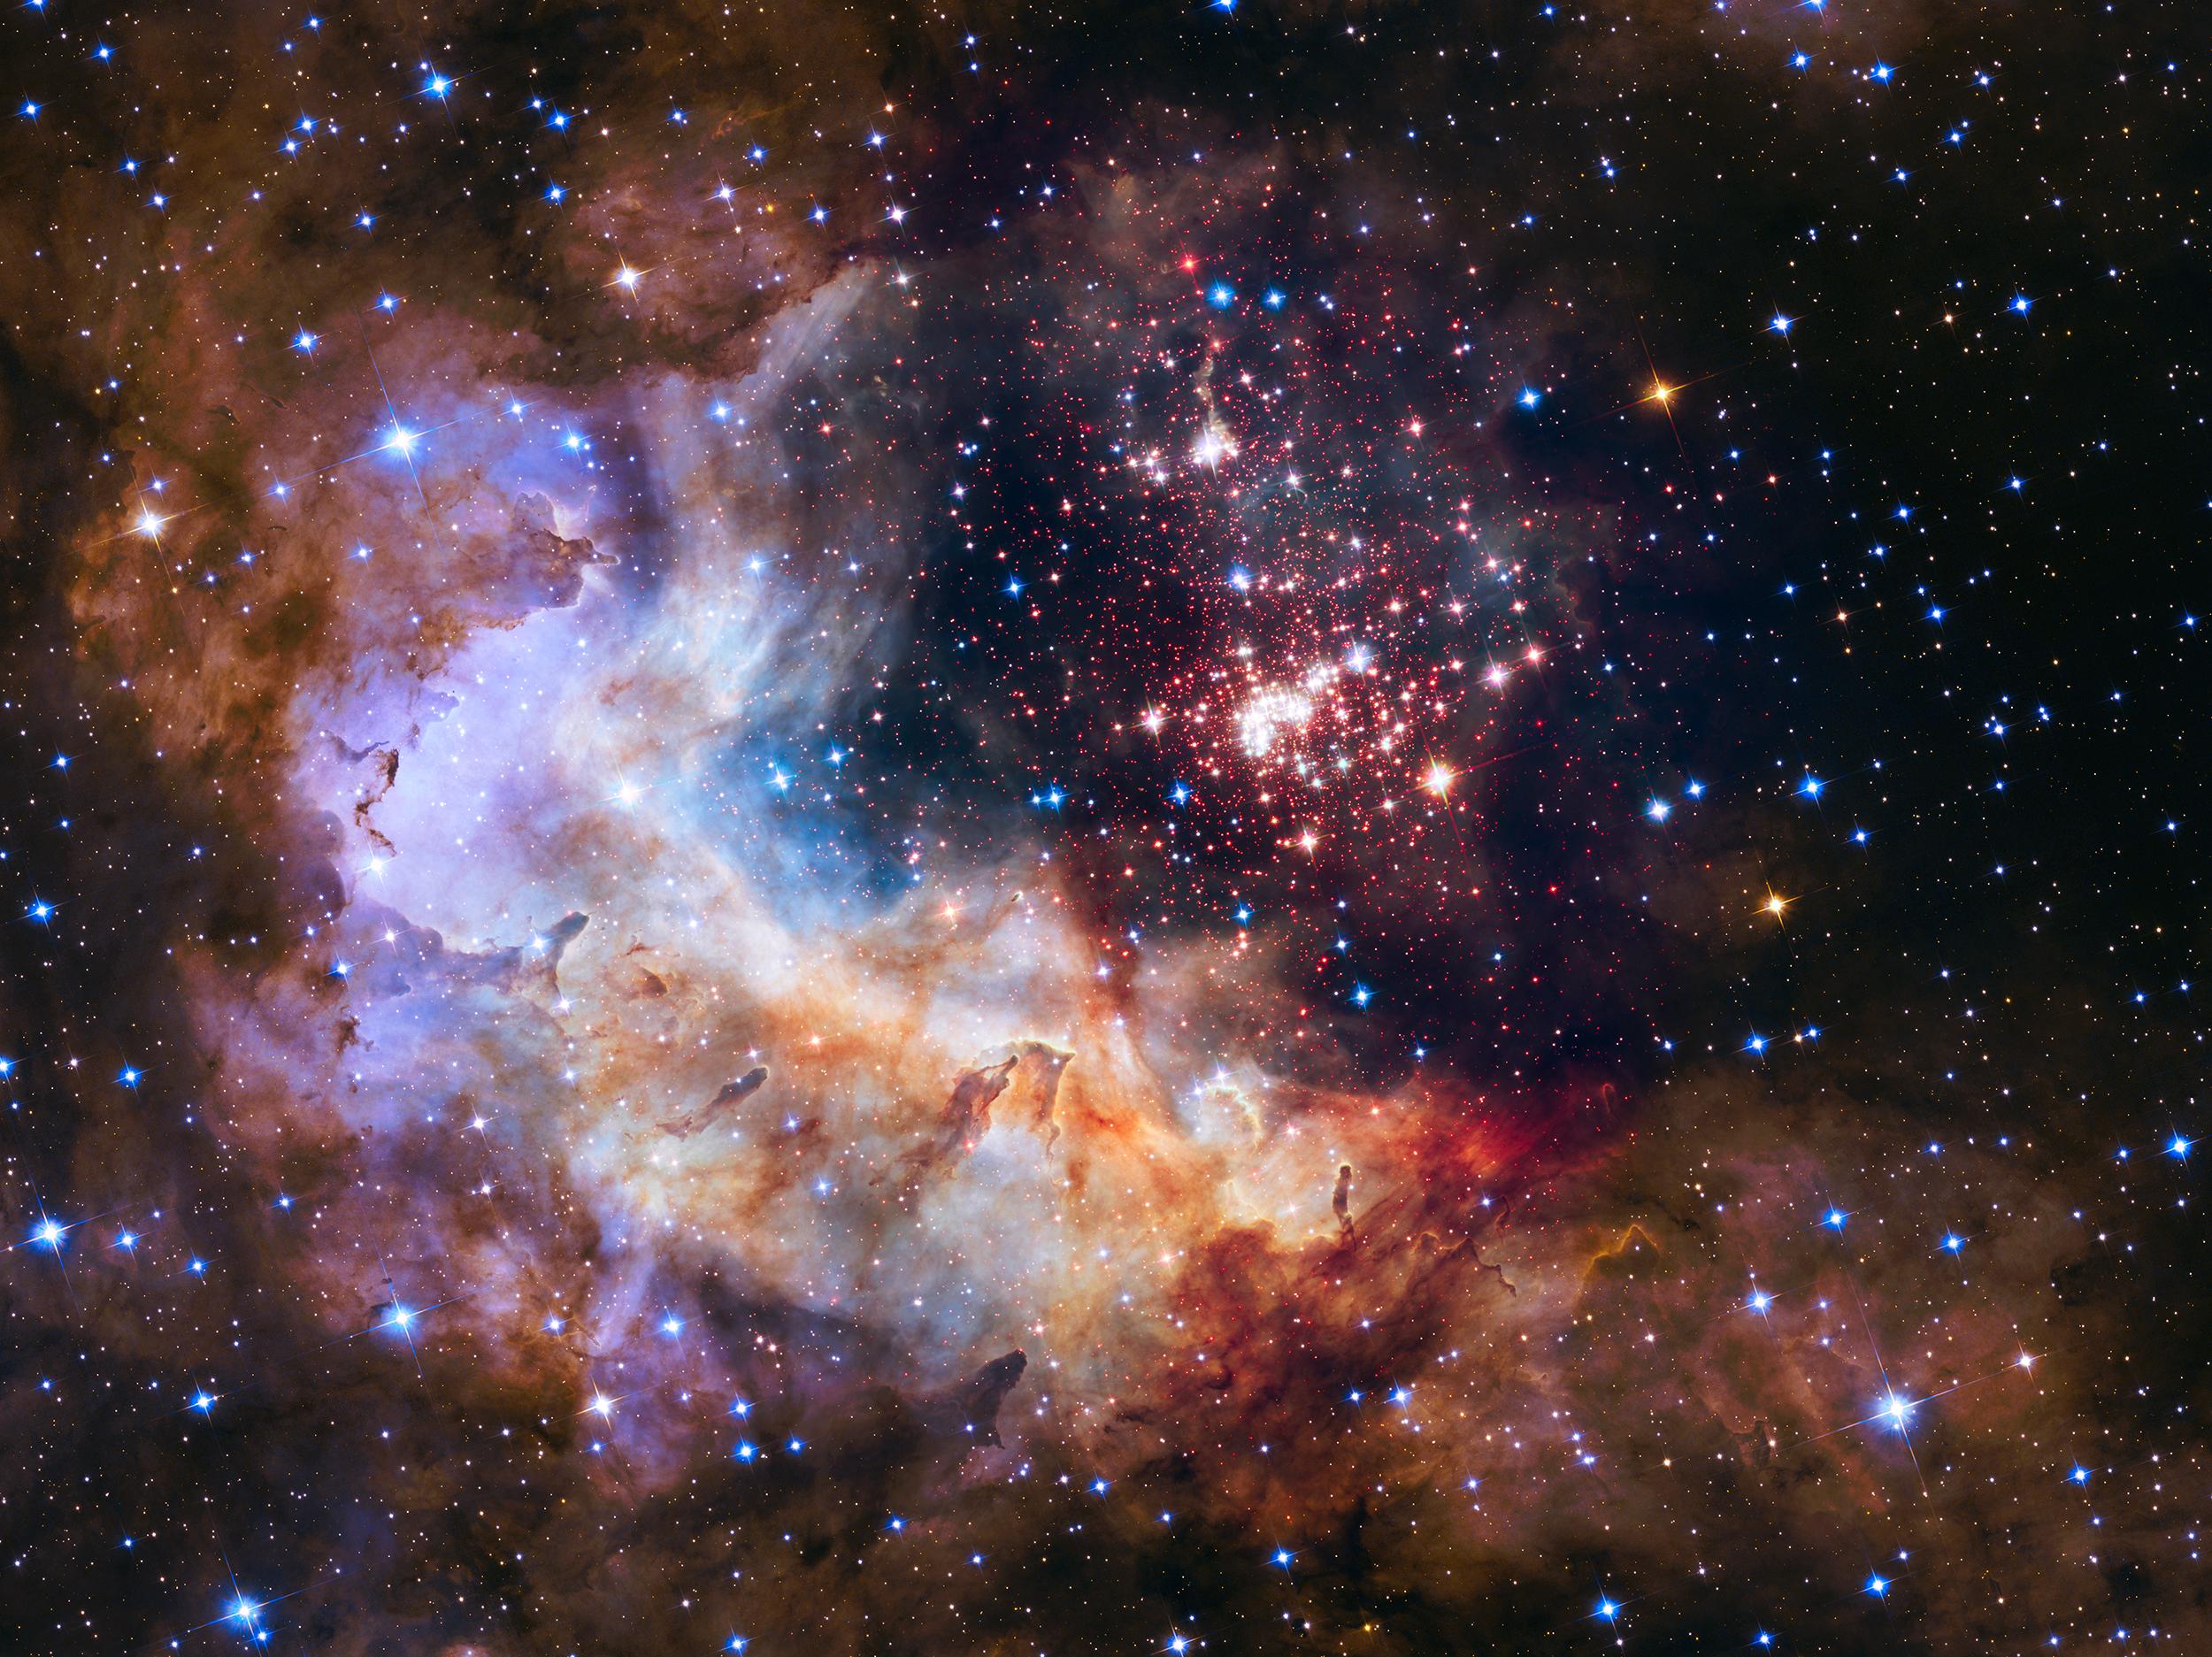 Nasa unveils star 39 fireworks 39 for hubble telescope 39 s 25th - Nasa screensaver ...